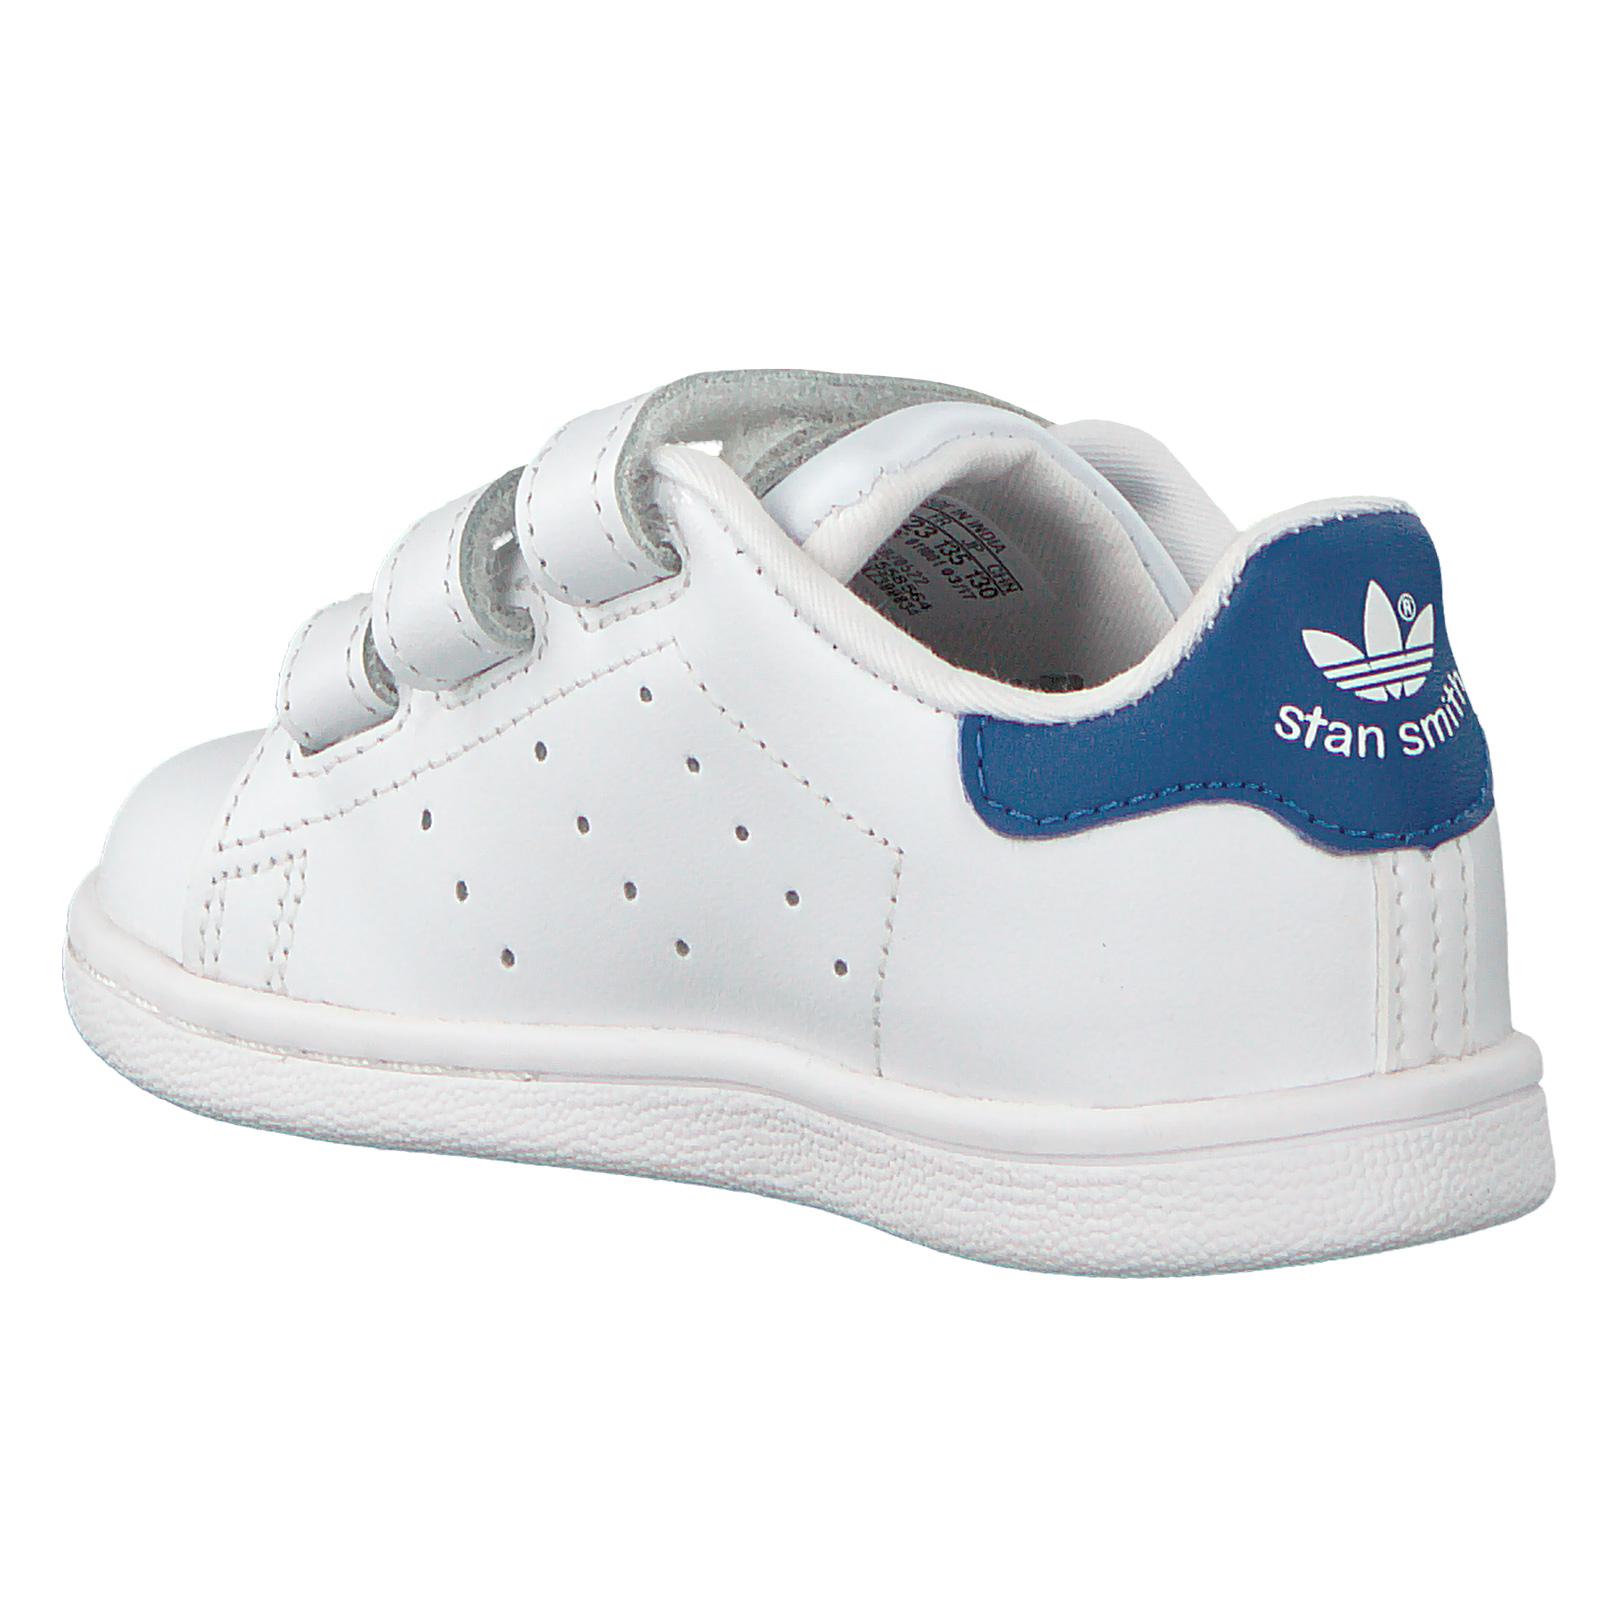 buy popular 726c7 95a93 adidas Originals Stan Smith Sneaker Kinder Turnschuhe Leder Schuhe Weiß  Blau 27